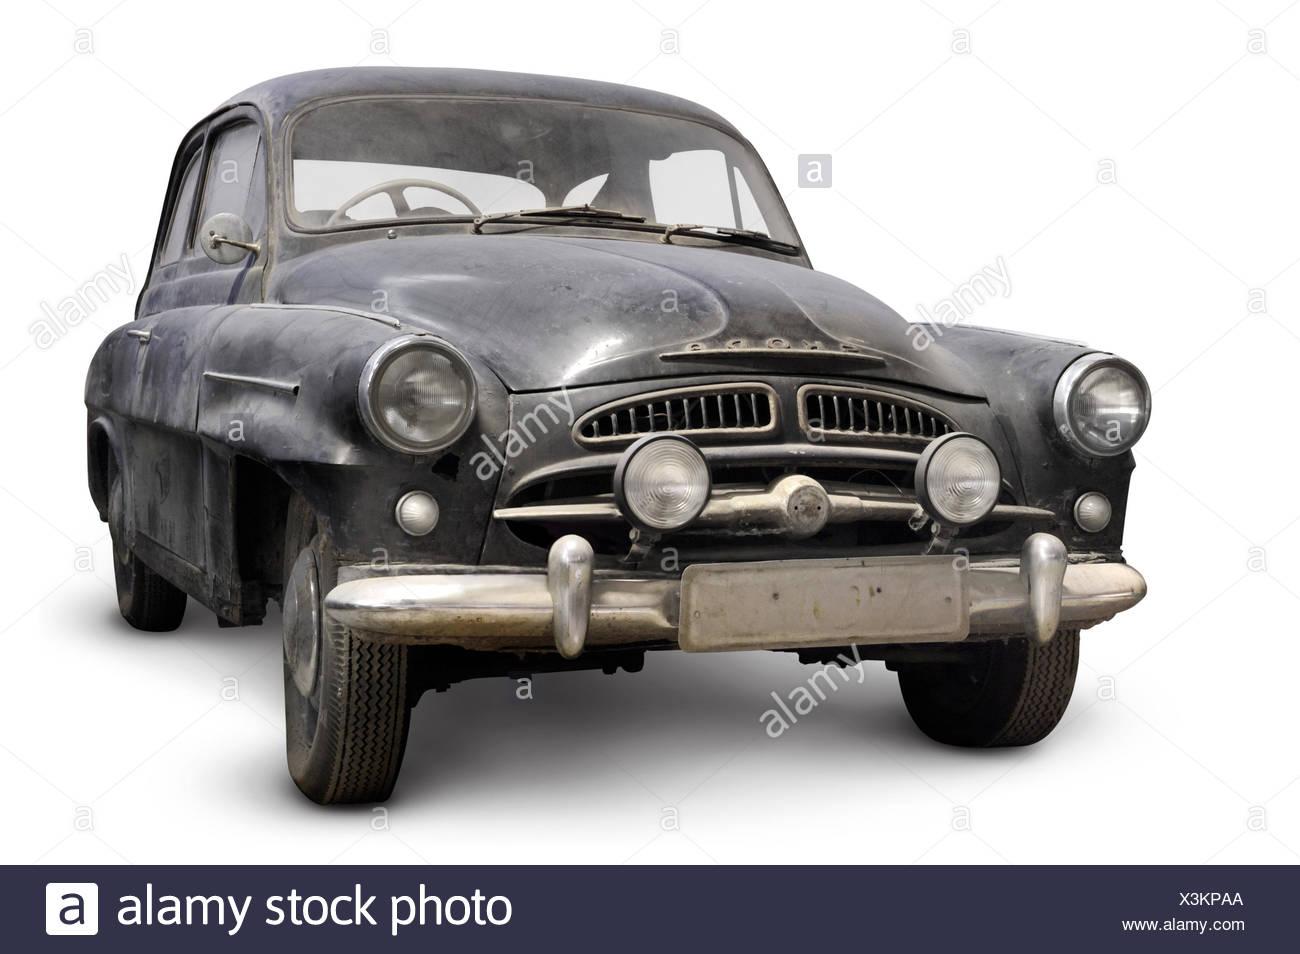 Old black Skoda 440 1956-1958 Spartak, Czech retro car, covered in dust - Stock Image